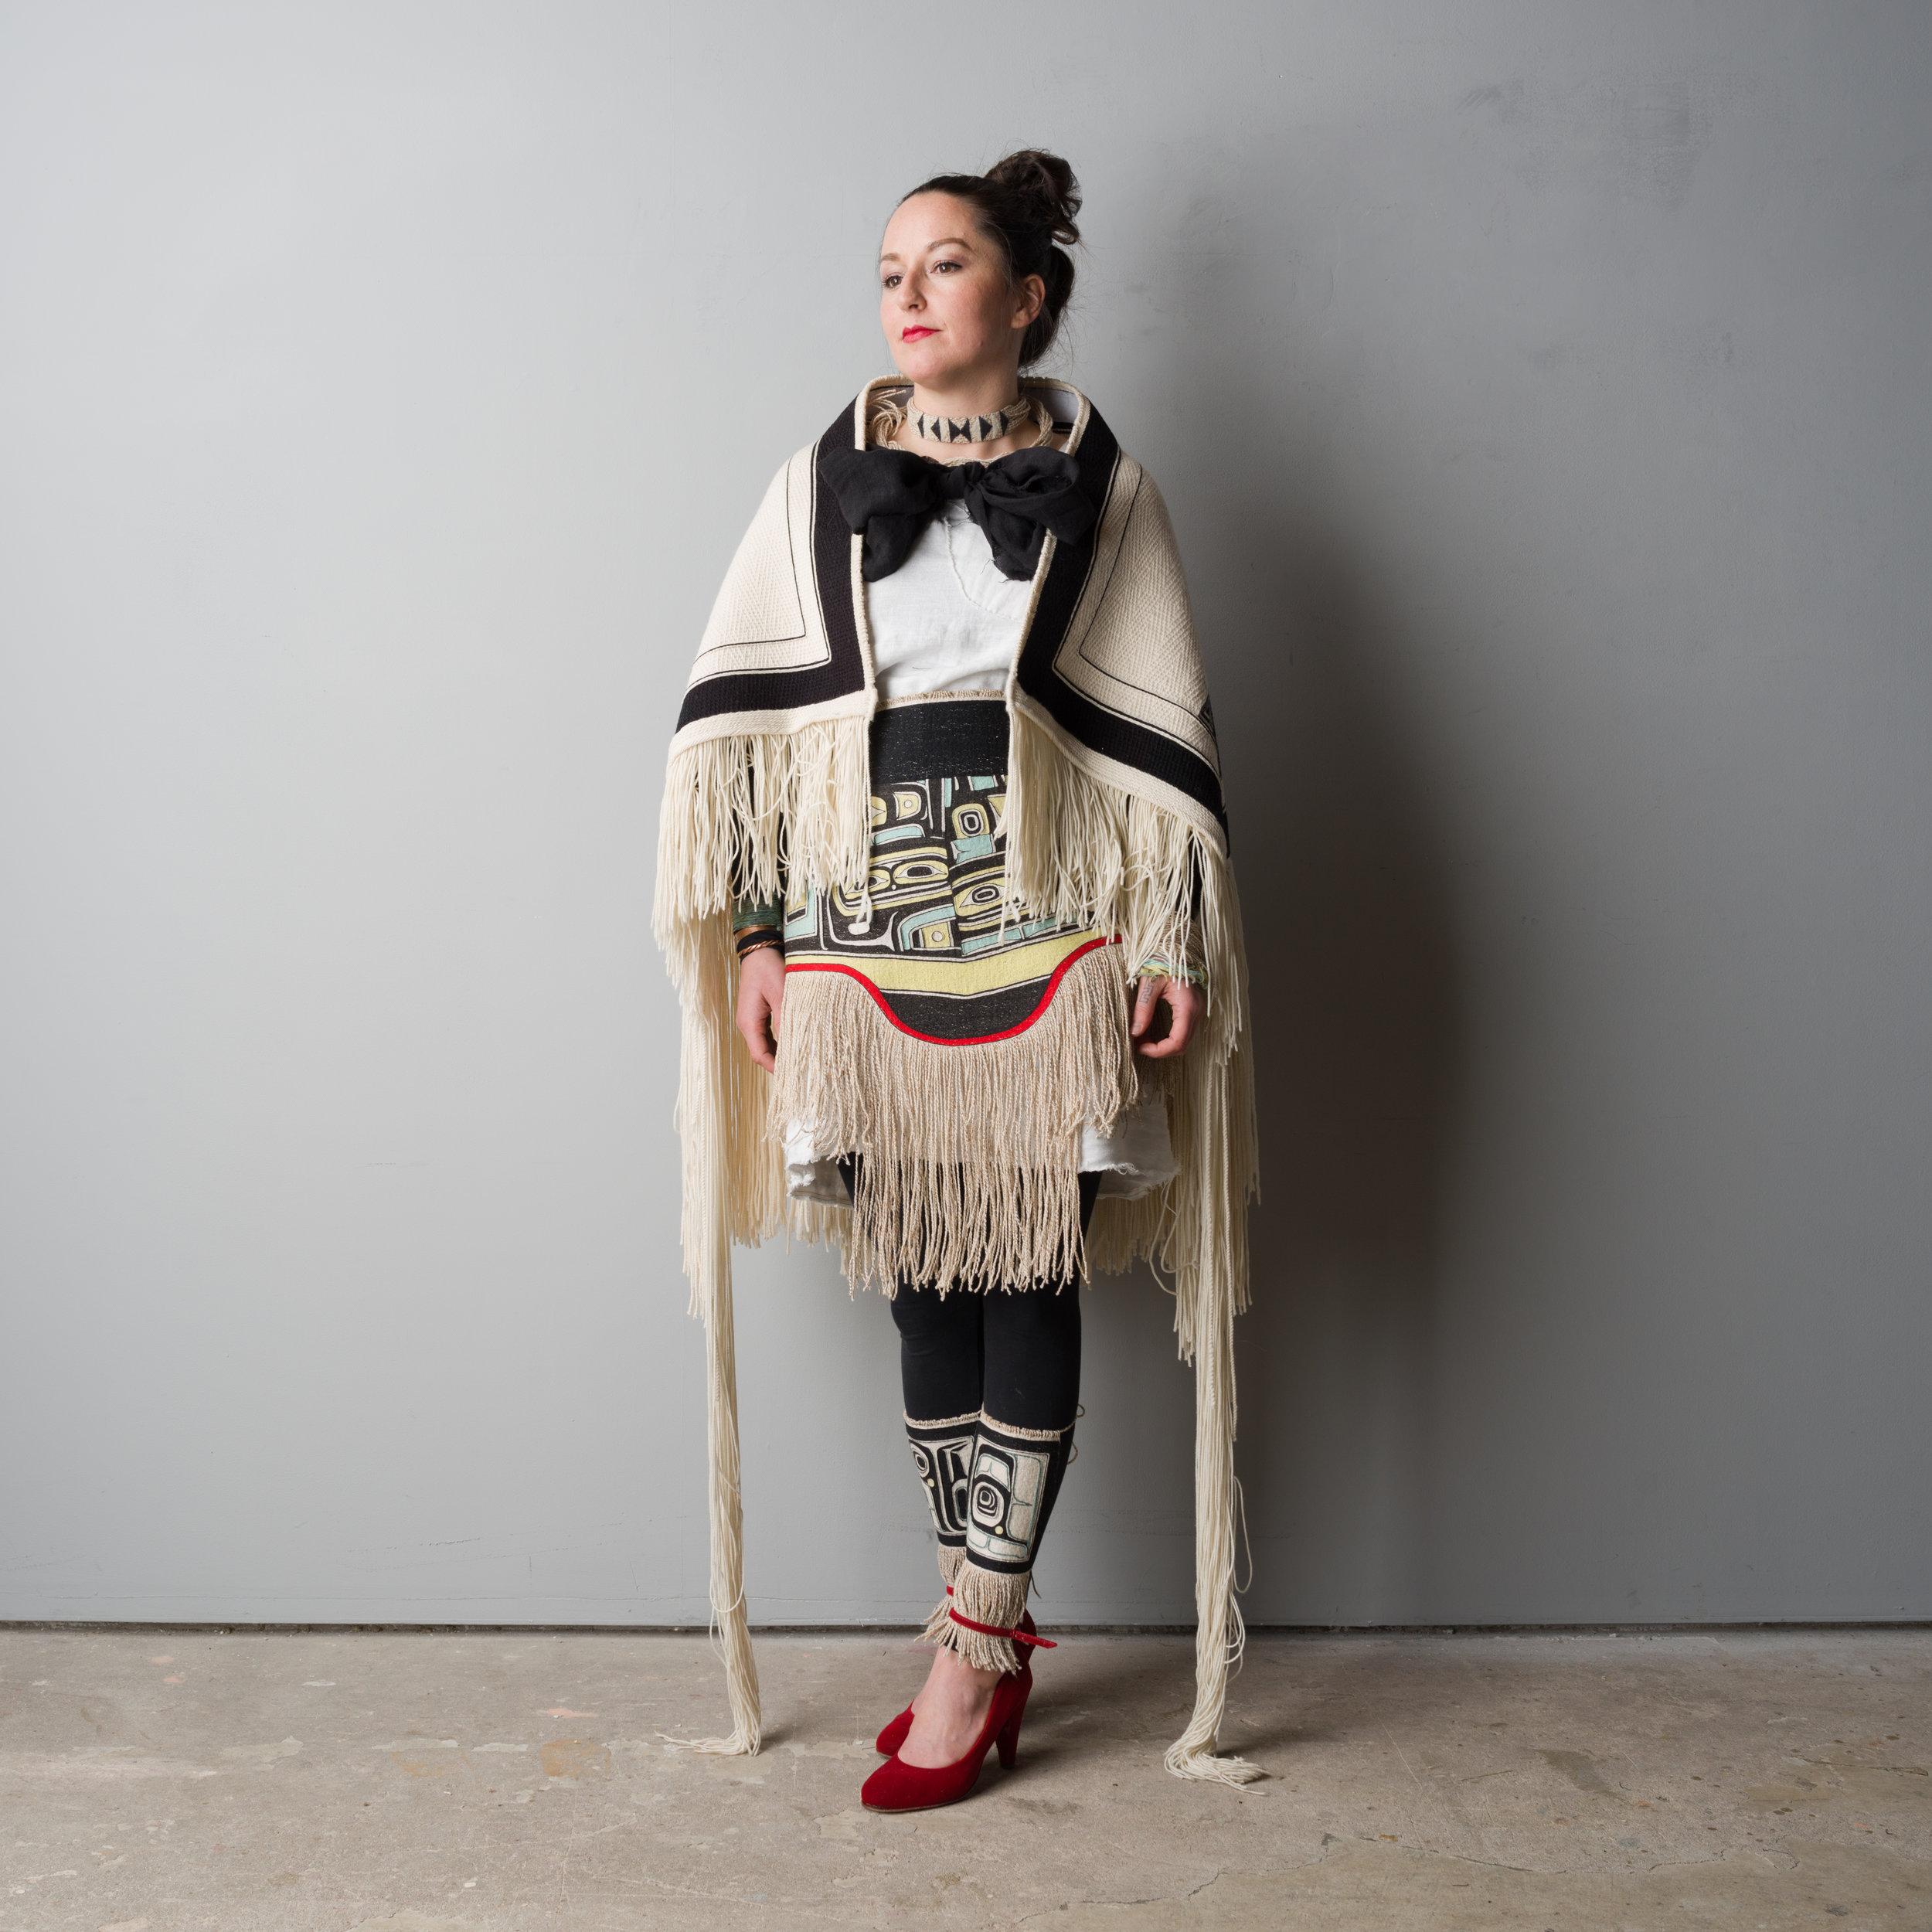 Exhibition catalog cover image for Interface: The Woven Artwork of Jaad Kuujus presented at Bill Reid Gallery of Northwest Coast Art September 19, 2018 – January 9, 2019. The artist Jaad Kuujus/Meghann O'Brien wears her handwoven Tlingit Raven's Tail Sky Blanket (2014. Merino wool, cashmere, mountain goat wool, 124.46cm x 132.08cm) and Haida apron The Spirit of Shape (2015–2018. Merino wool, cashmere, cedar bark, linen, 73.66cm x 38.1 cm).  Photo: David Koppe. Courtesy of the artist and Bill Reid Gallery of Northwest Coast Art, Vancouver, BC.